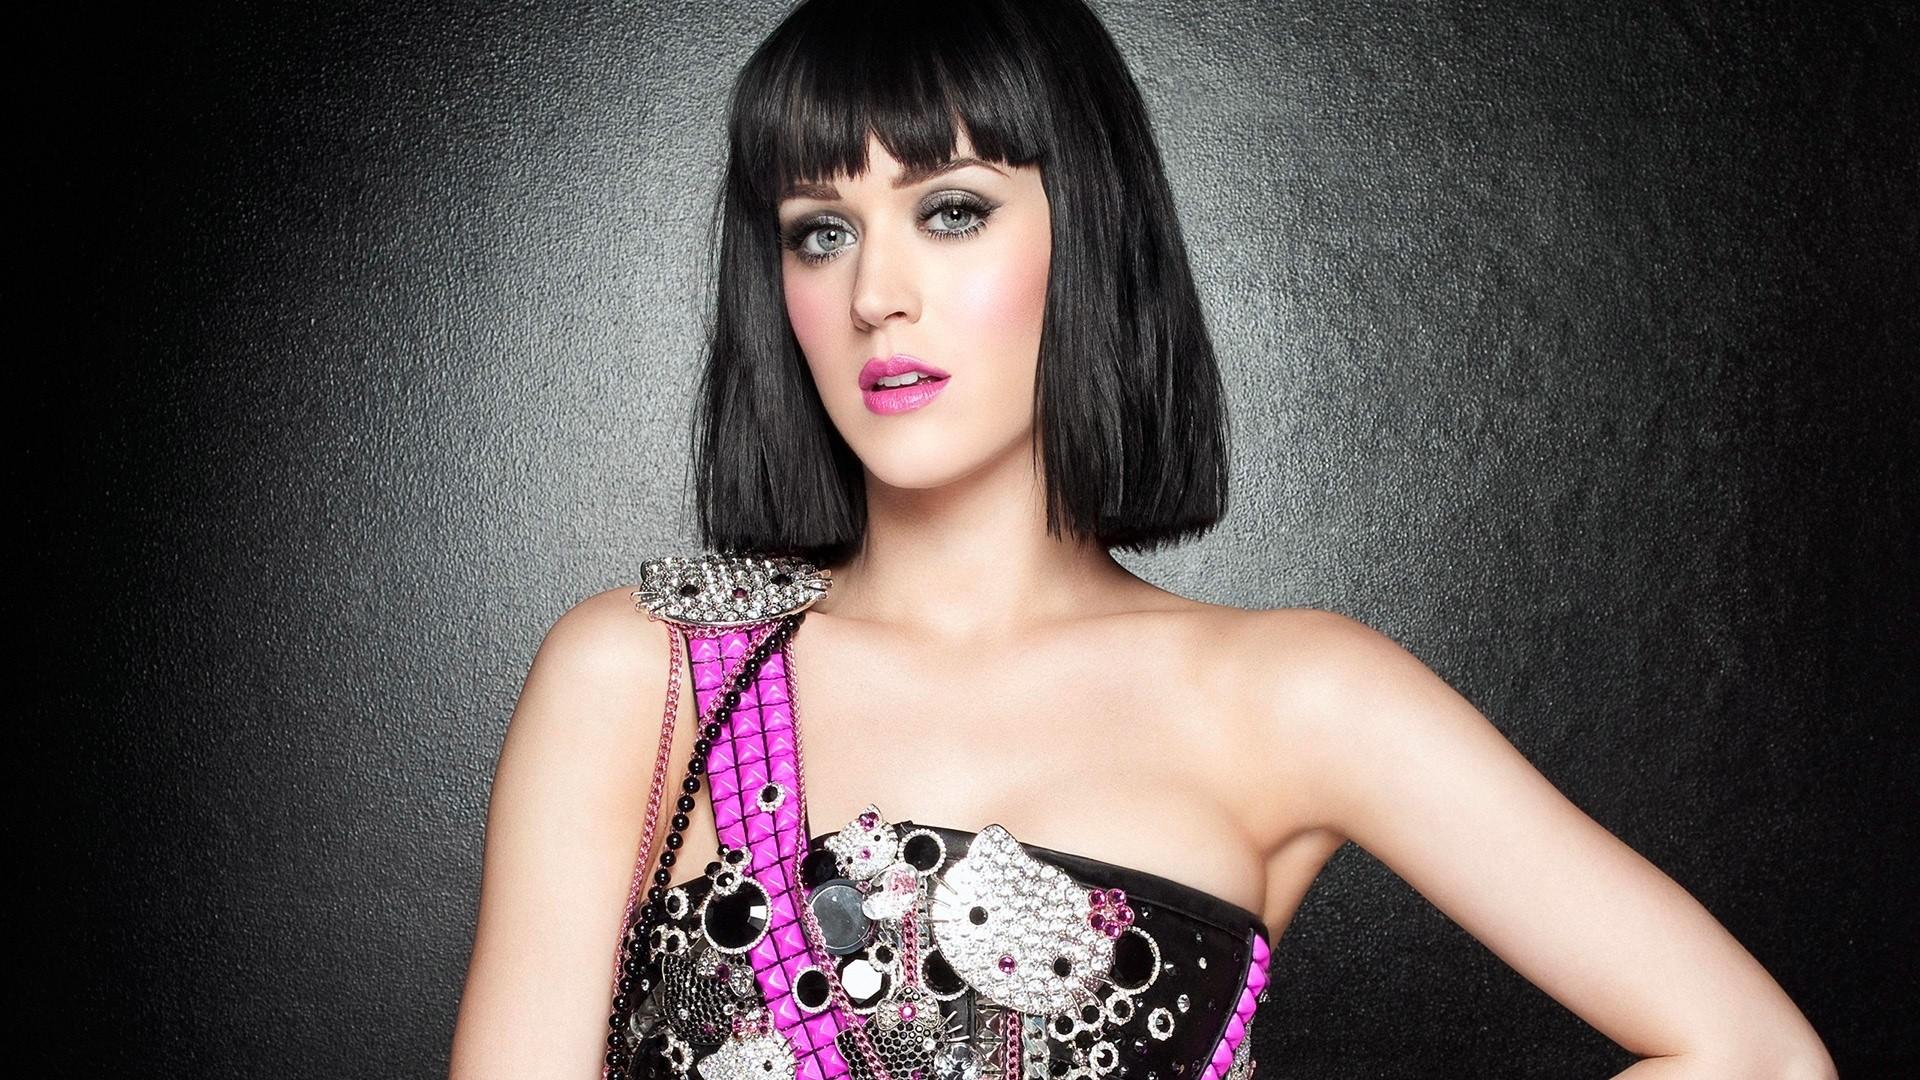 Katy Perry wallpaper photo hd